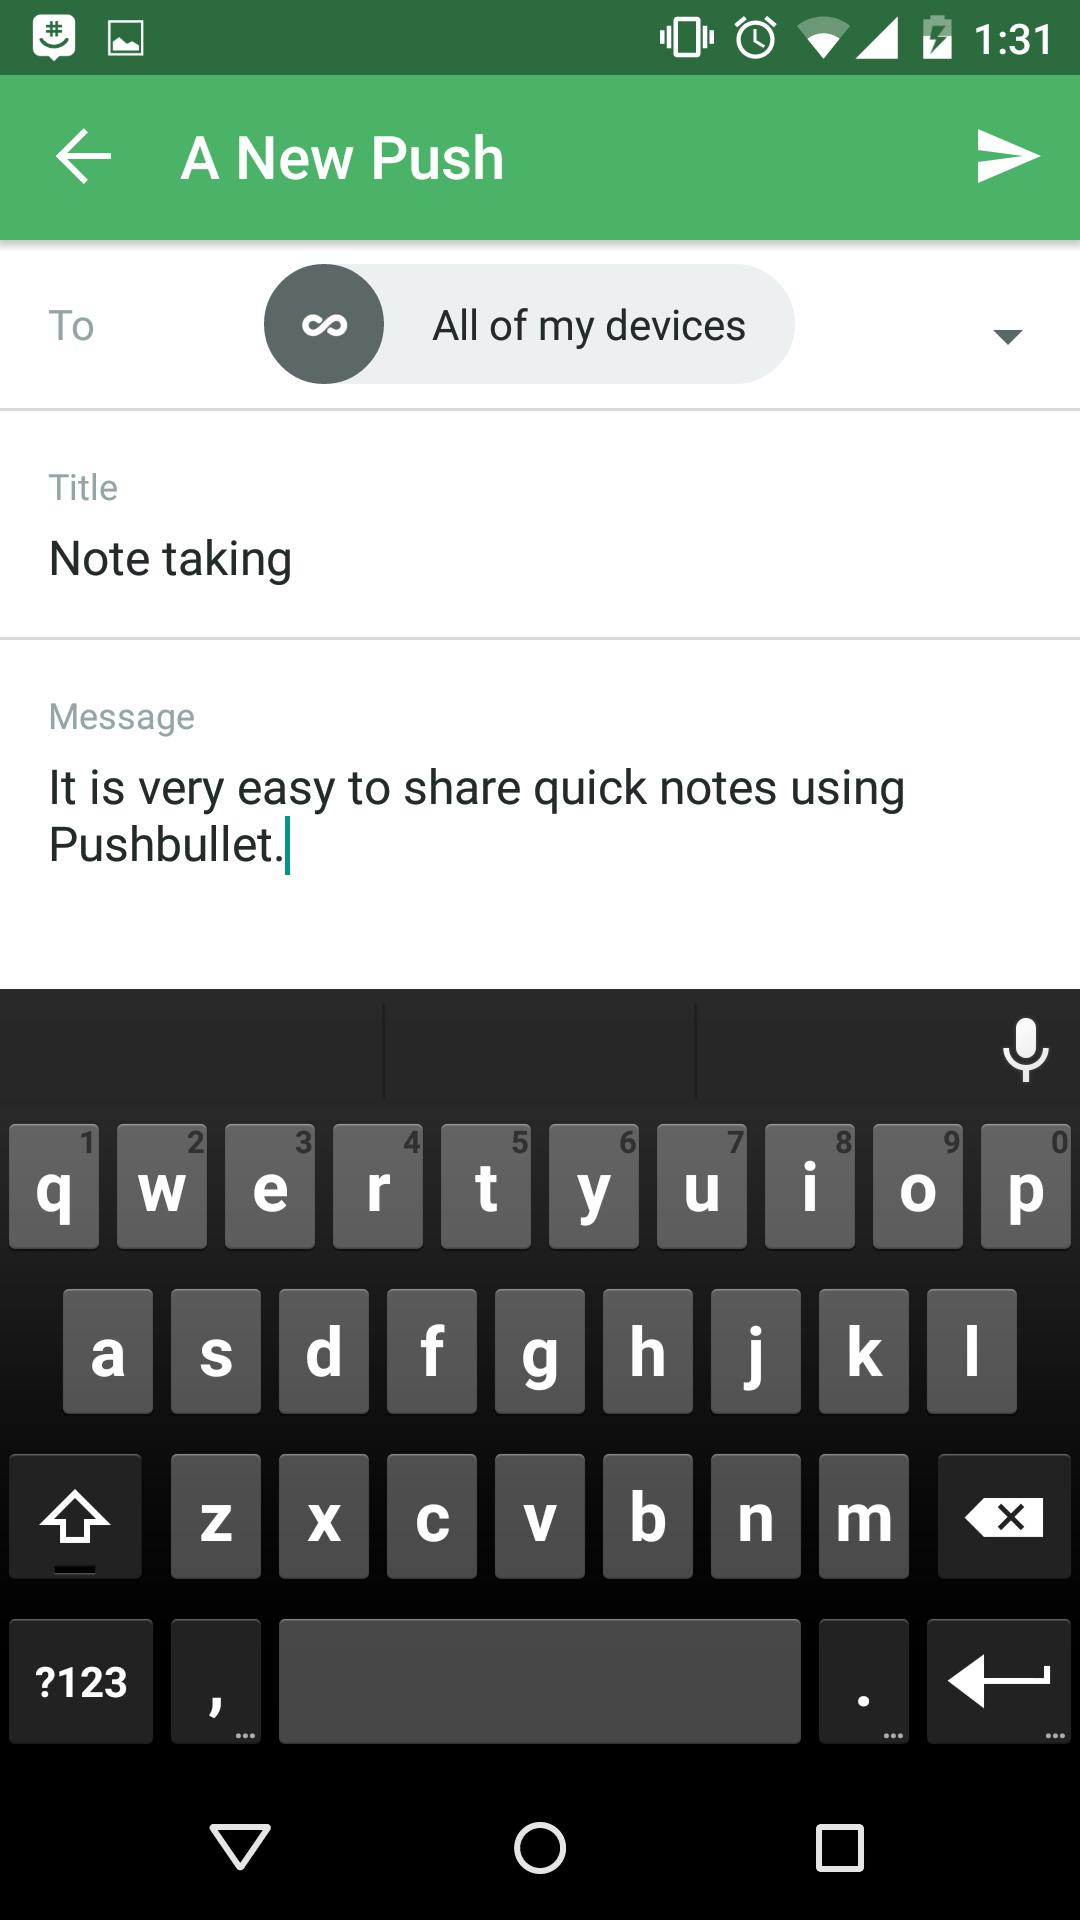 Pushbullet_notes